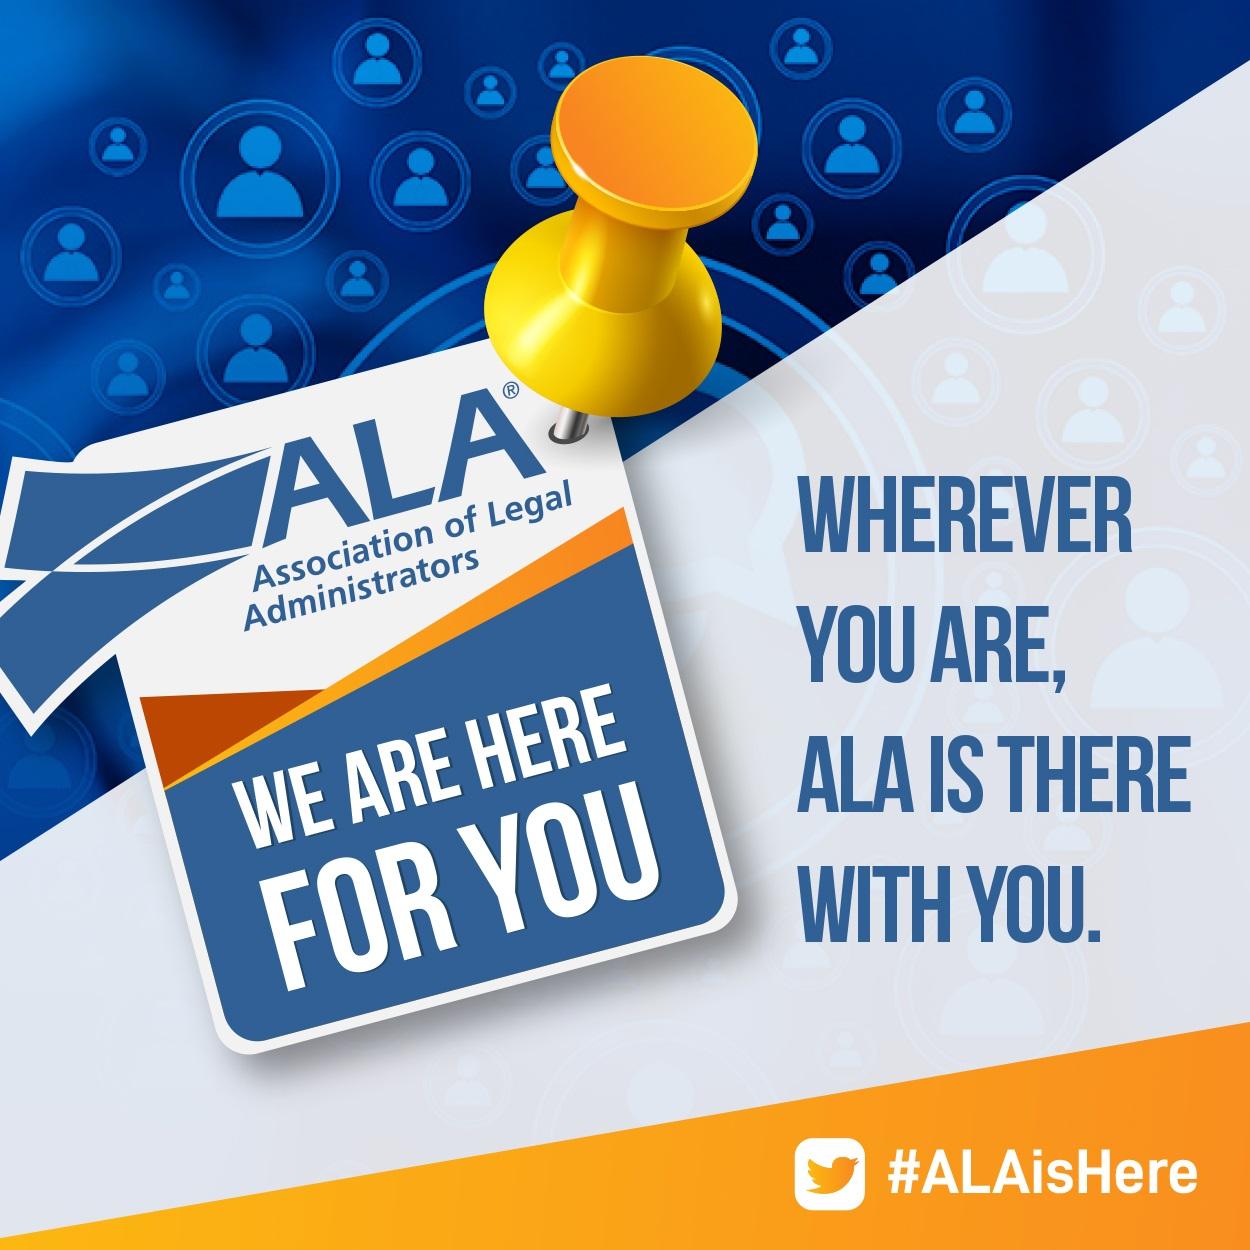 #ALAisHere